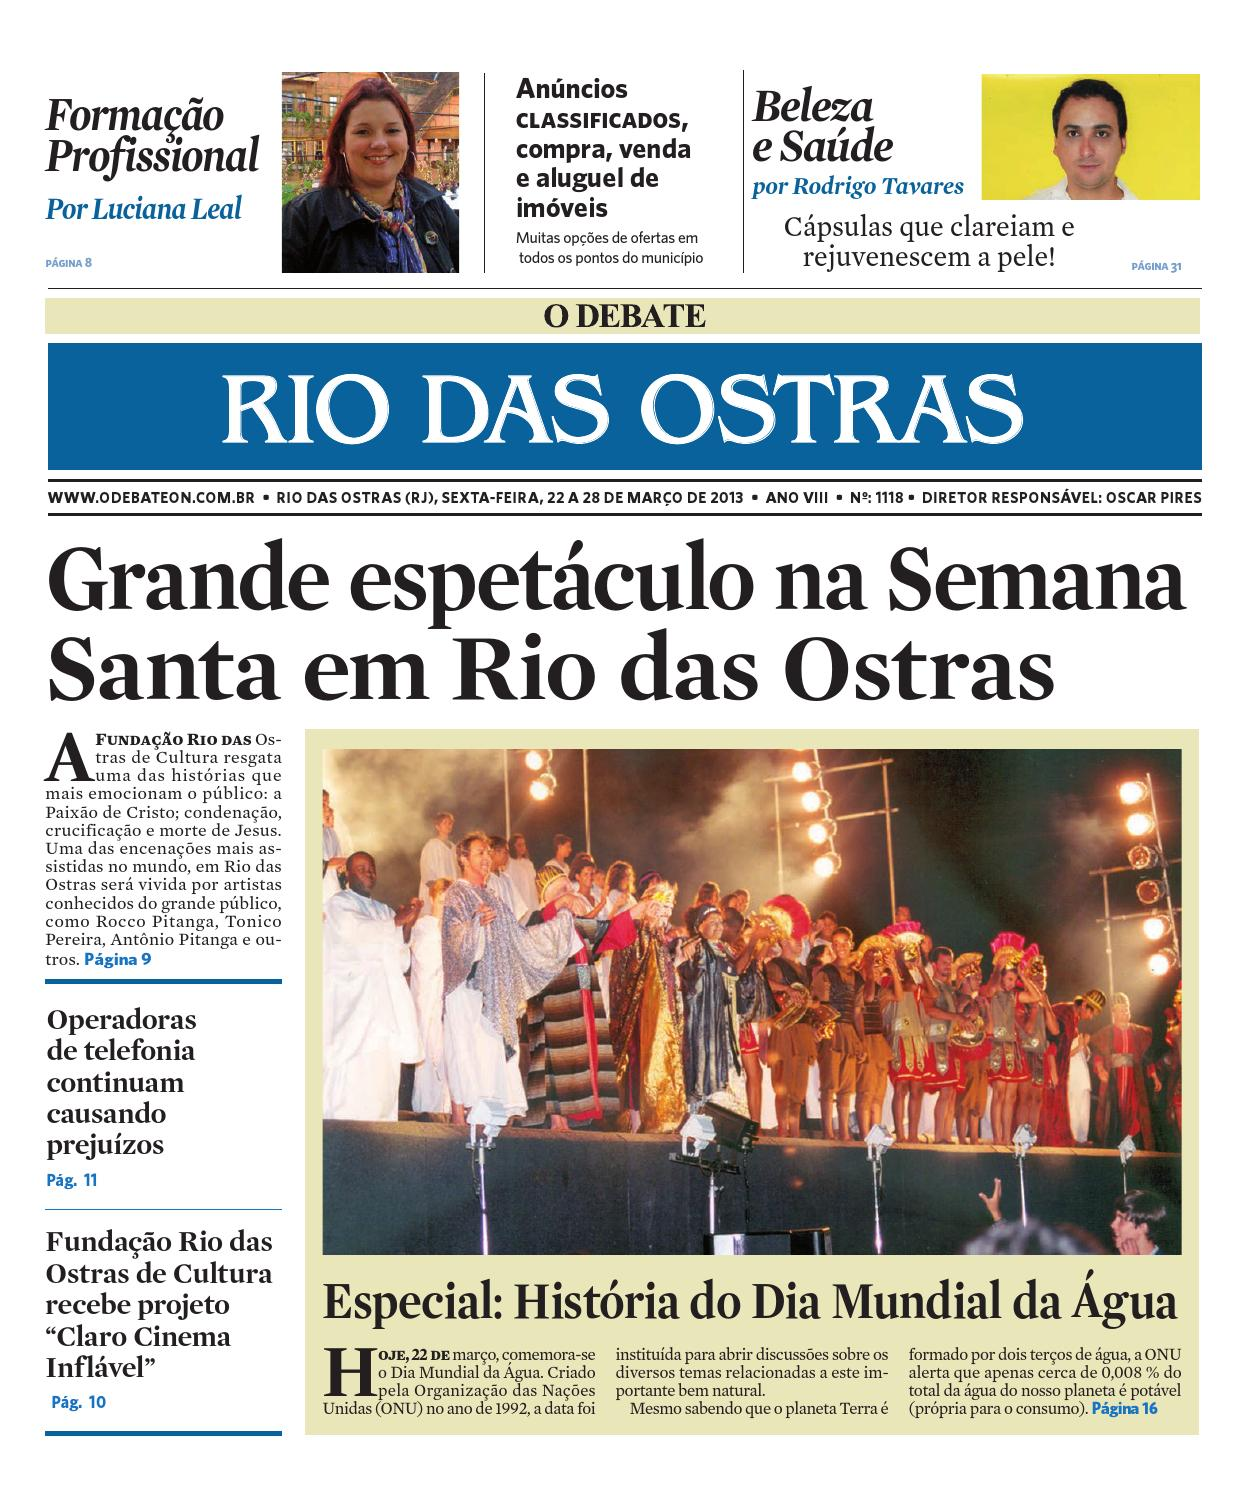 Armario Ingles Wordreference ~ Rio das Ostras 220313 by O DEBATE Diario de Macae issuu